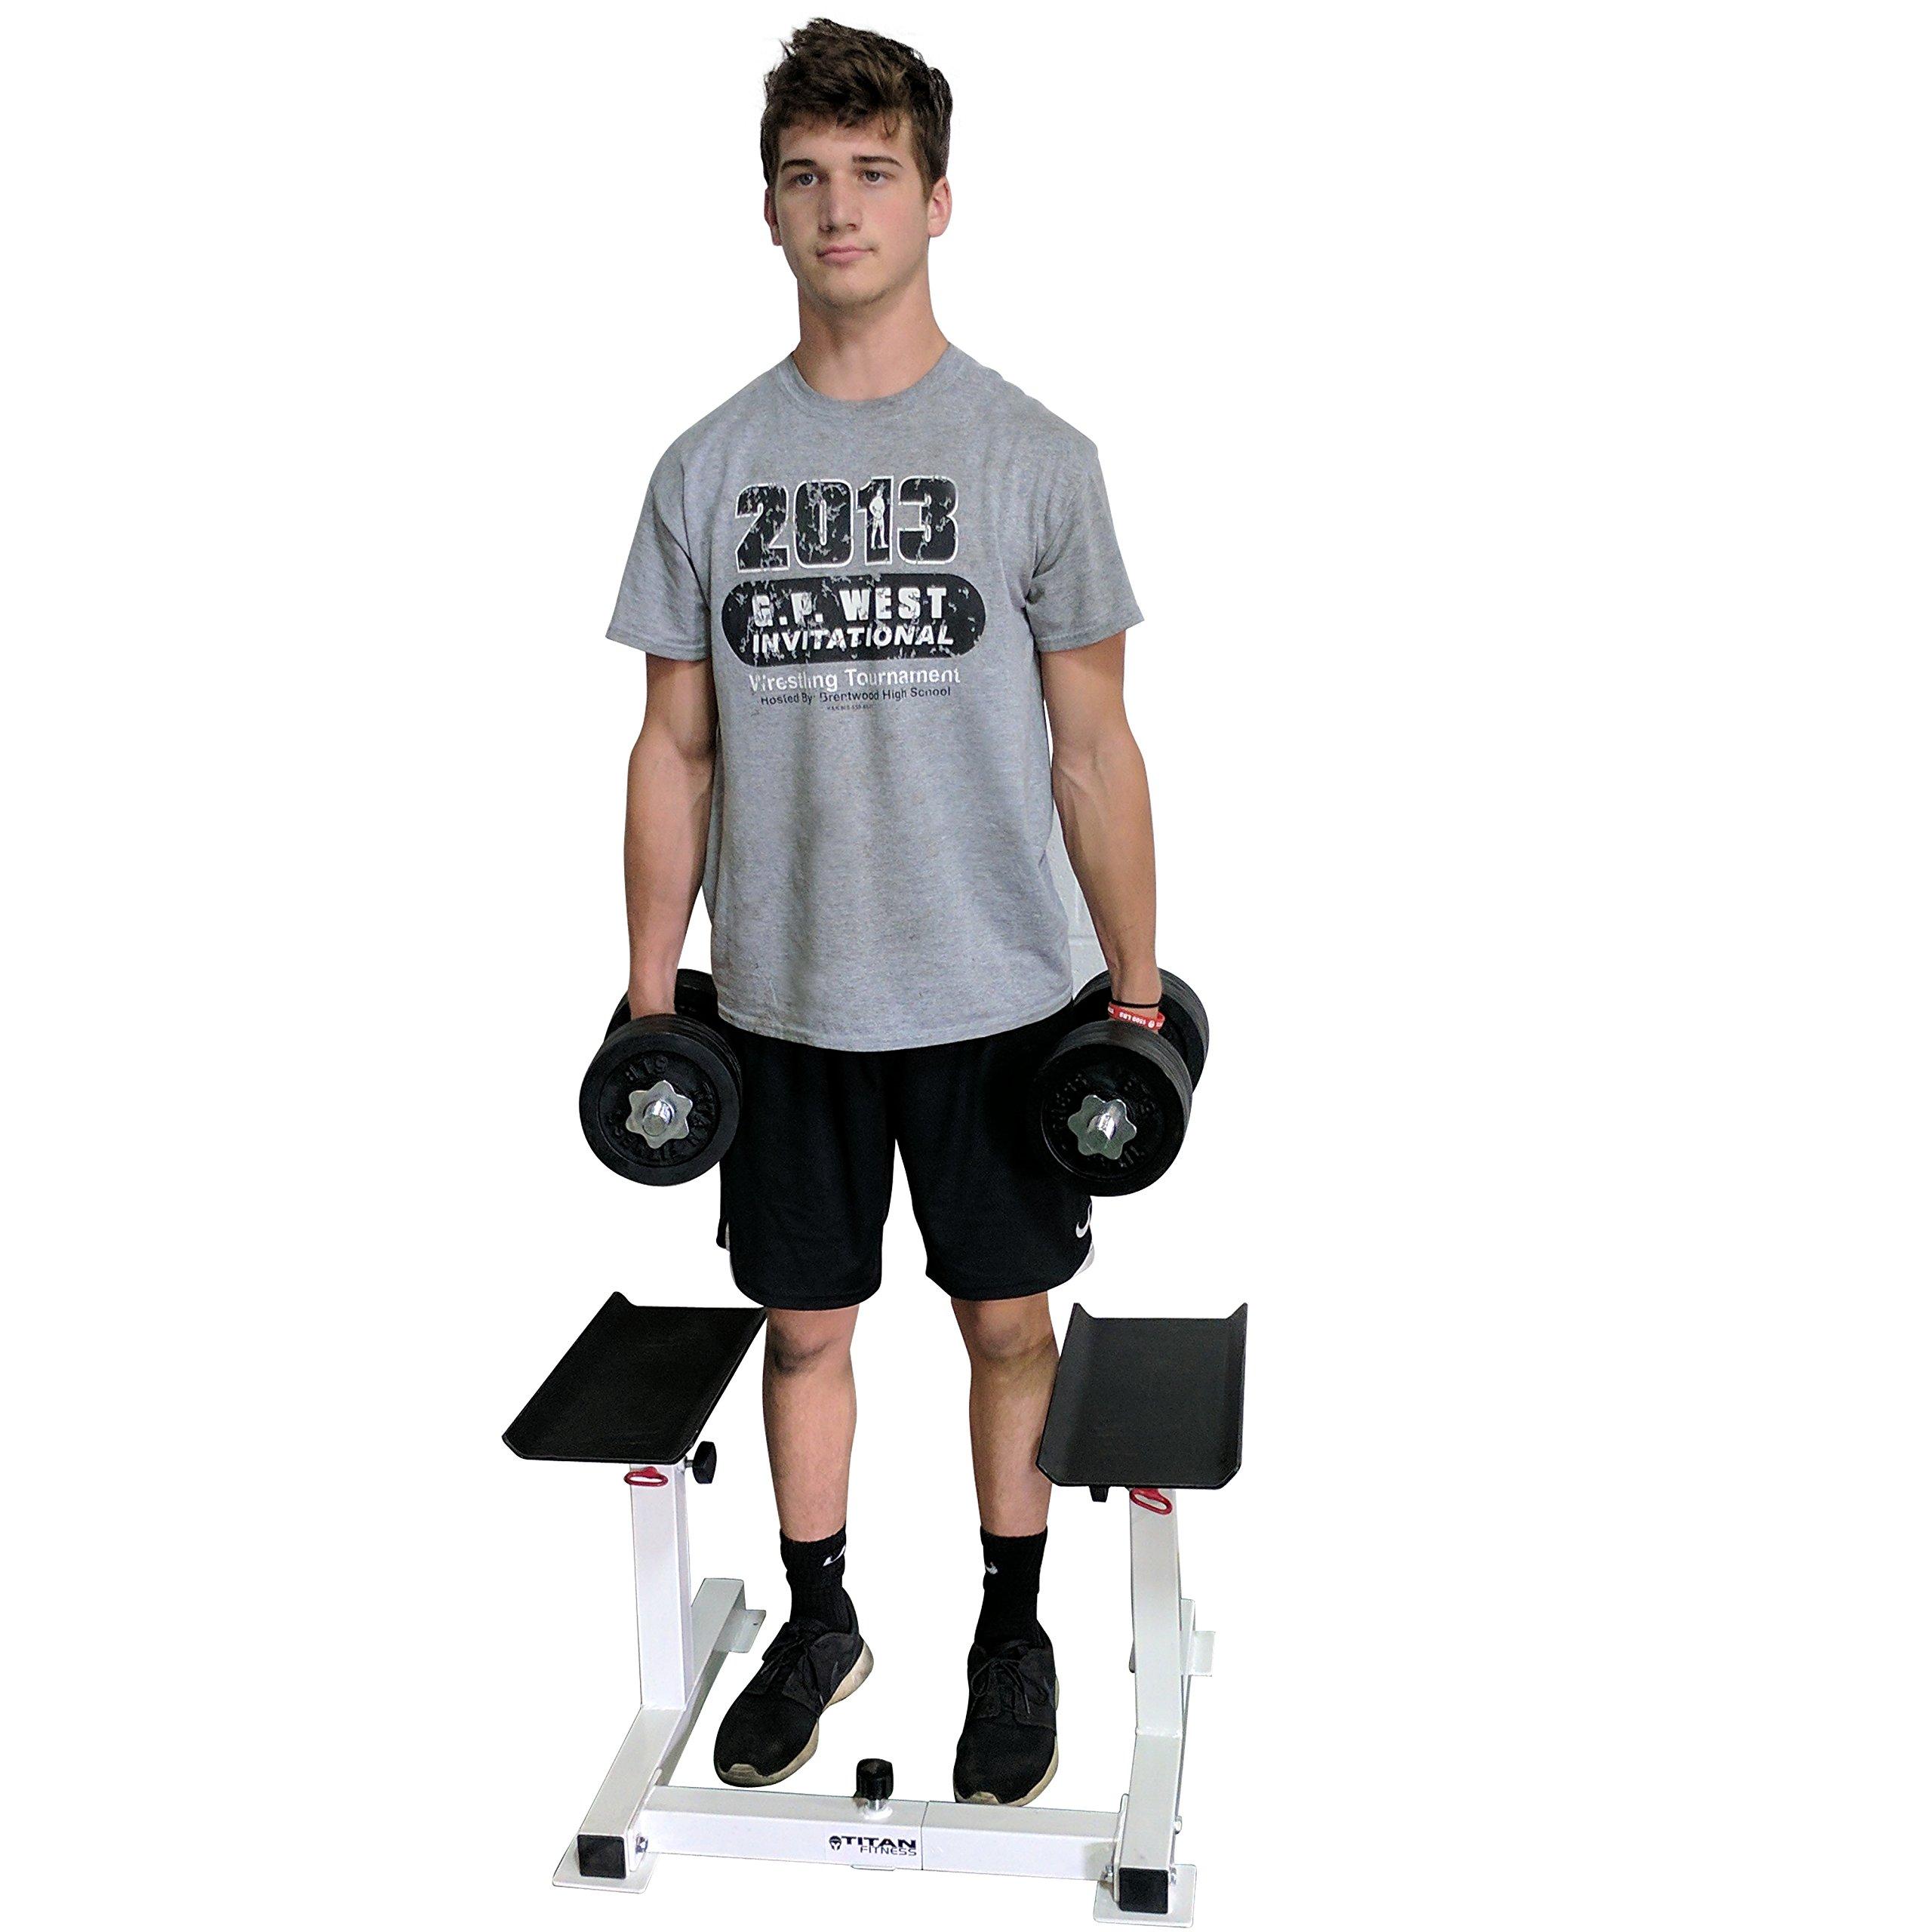 Titan Adjustable Height Dumbbell Holder by Titan Fitness (Image #6)